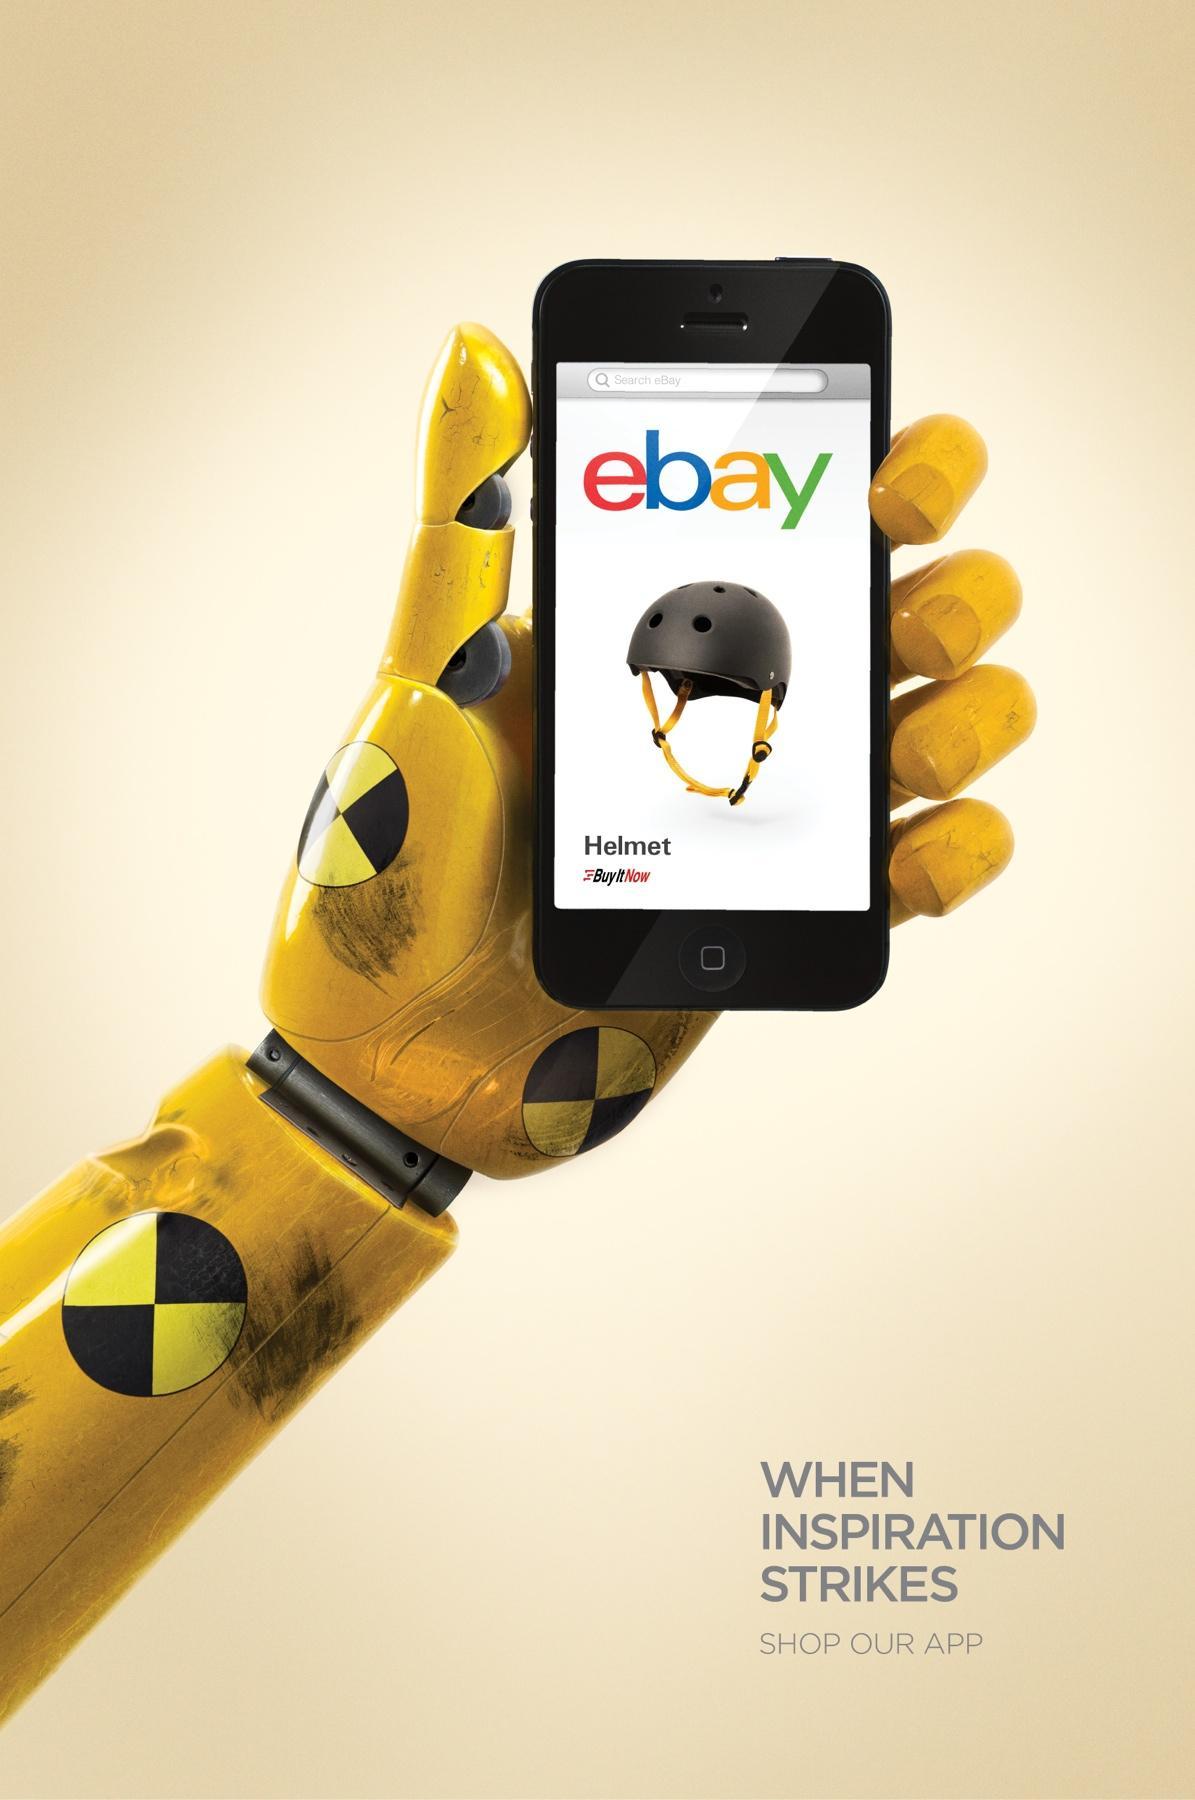 ebay Print Ad -  Helmet